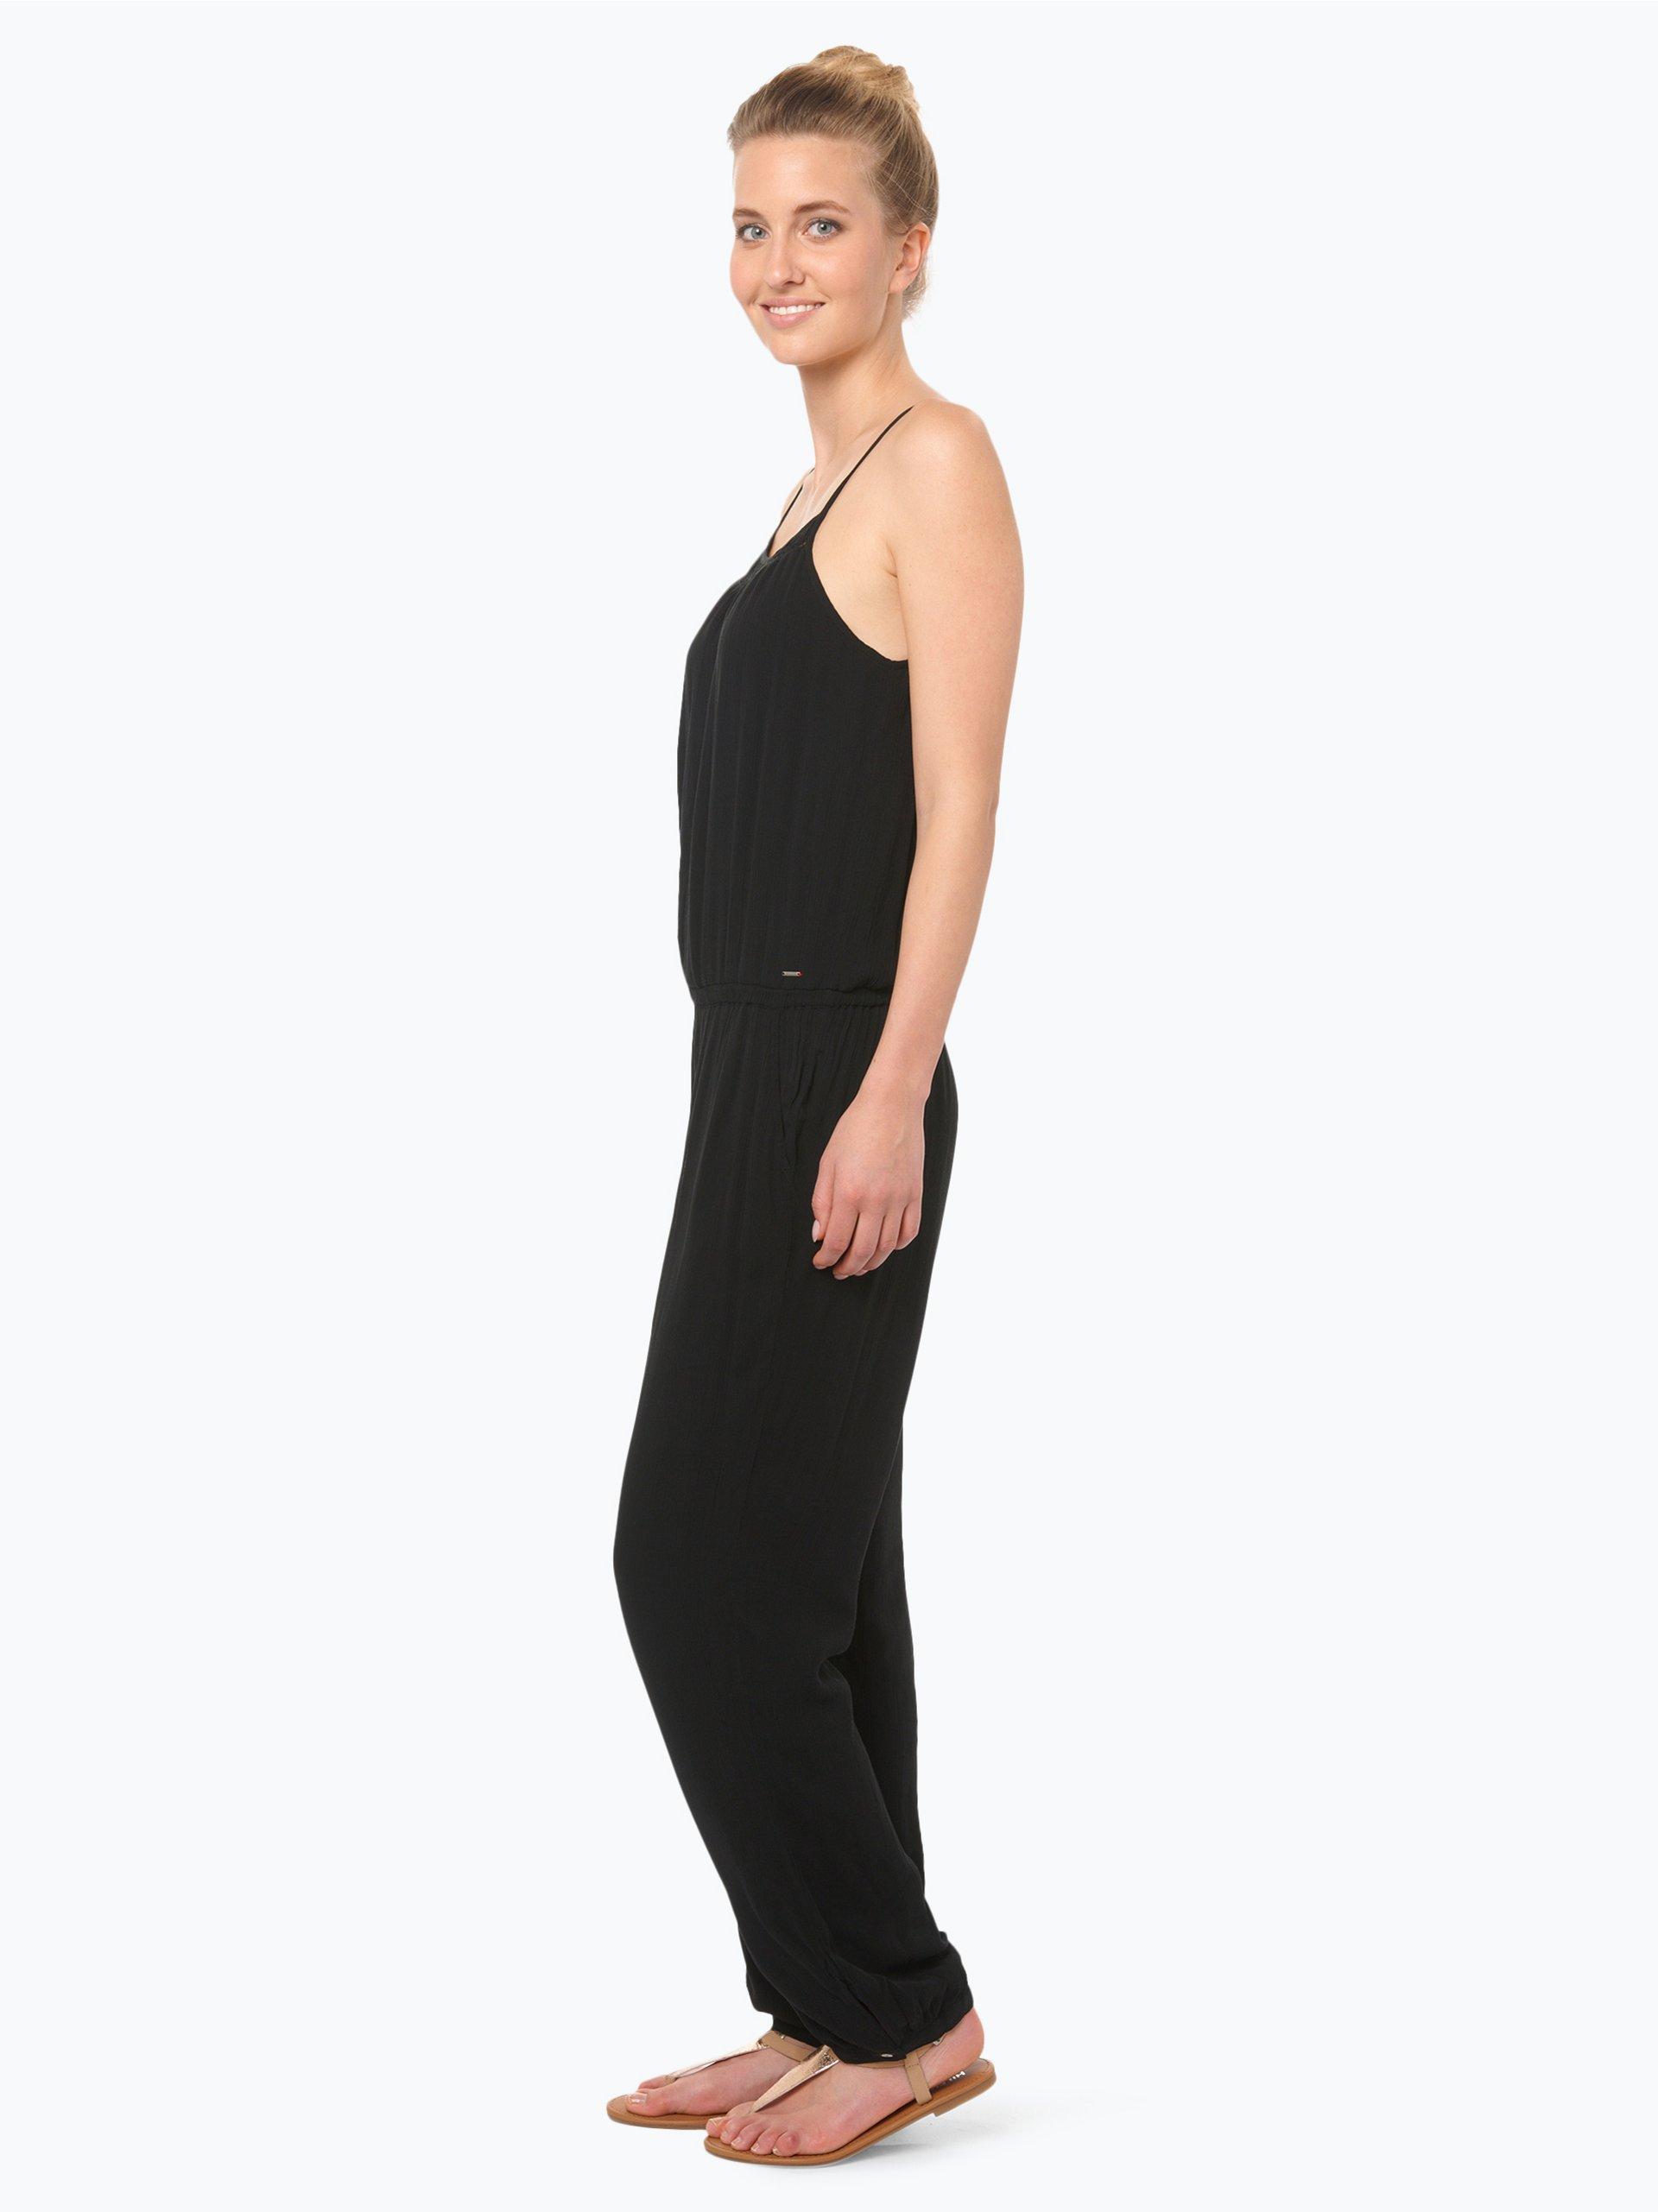 tommy jeans damen jumpsuit wei uni online kaufen. Black Bedroom Furniture Sets. Home Design Ideas